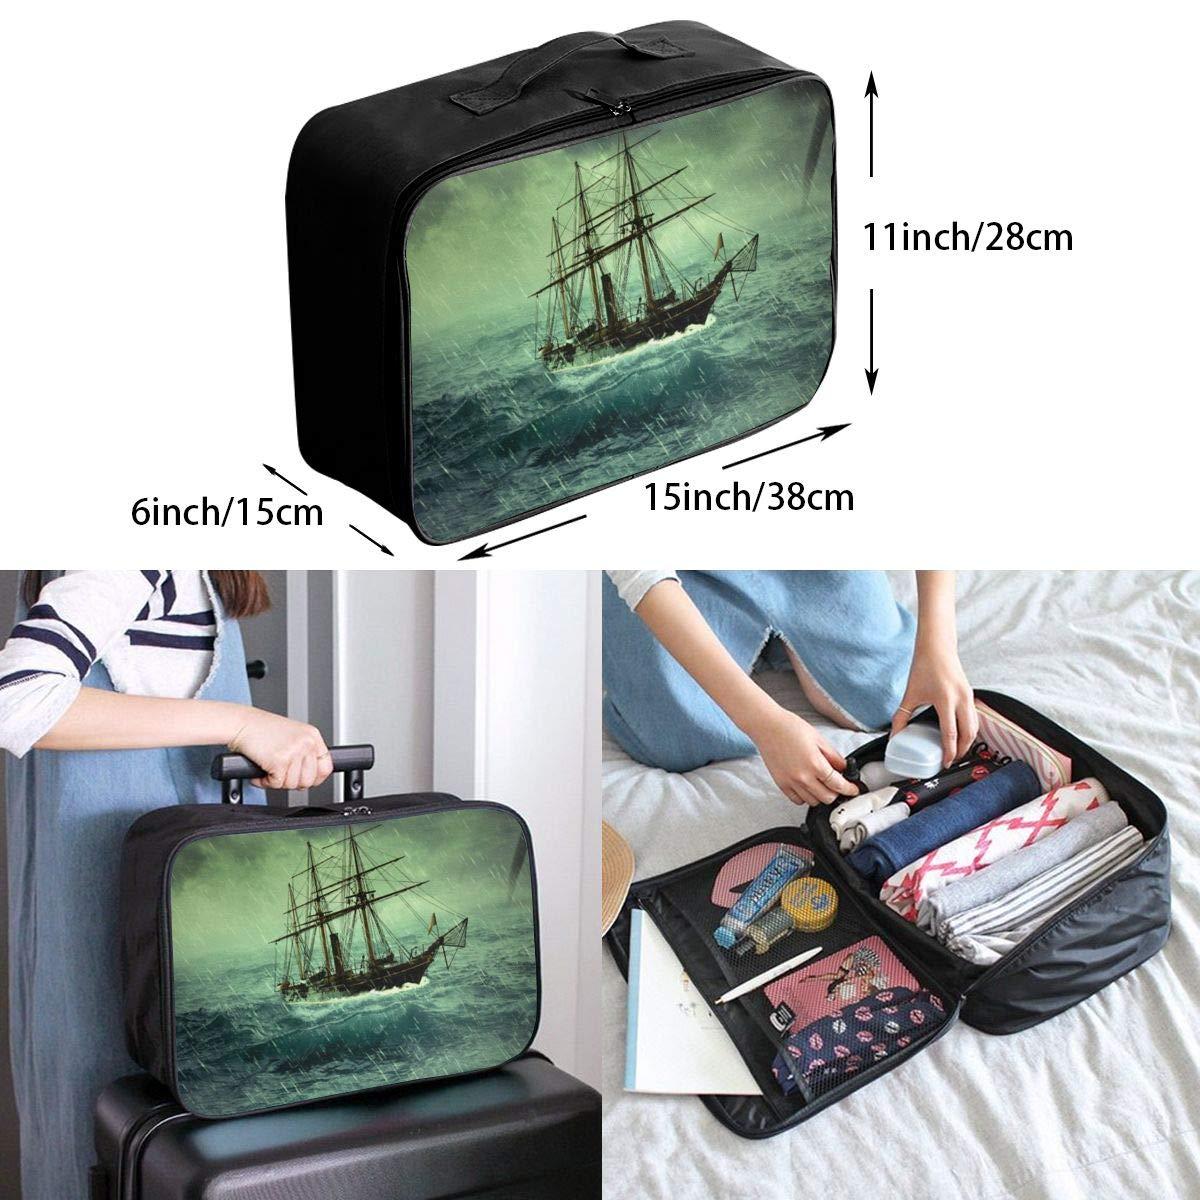 Storm Ocean Sailboat Tornado Travel Lightweight Waterproof Foldable Storage Carry Luggage Large Capacity Portable Luggage Bag Duffel Bag